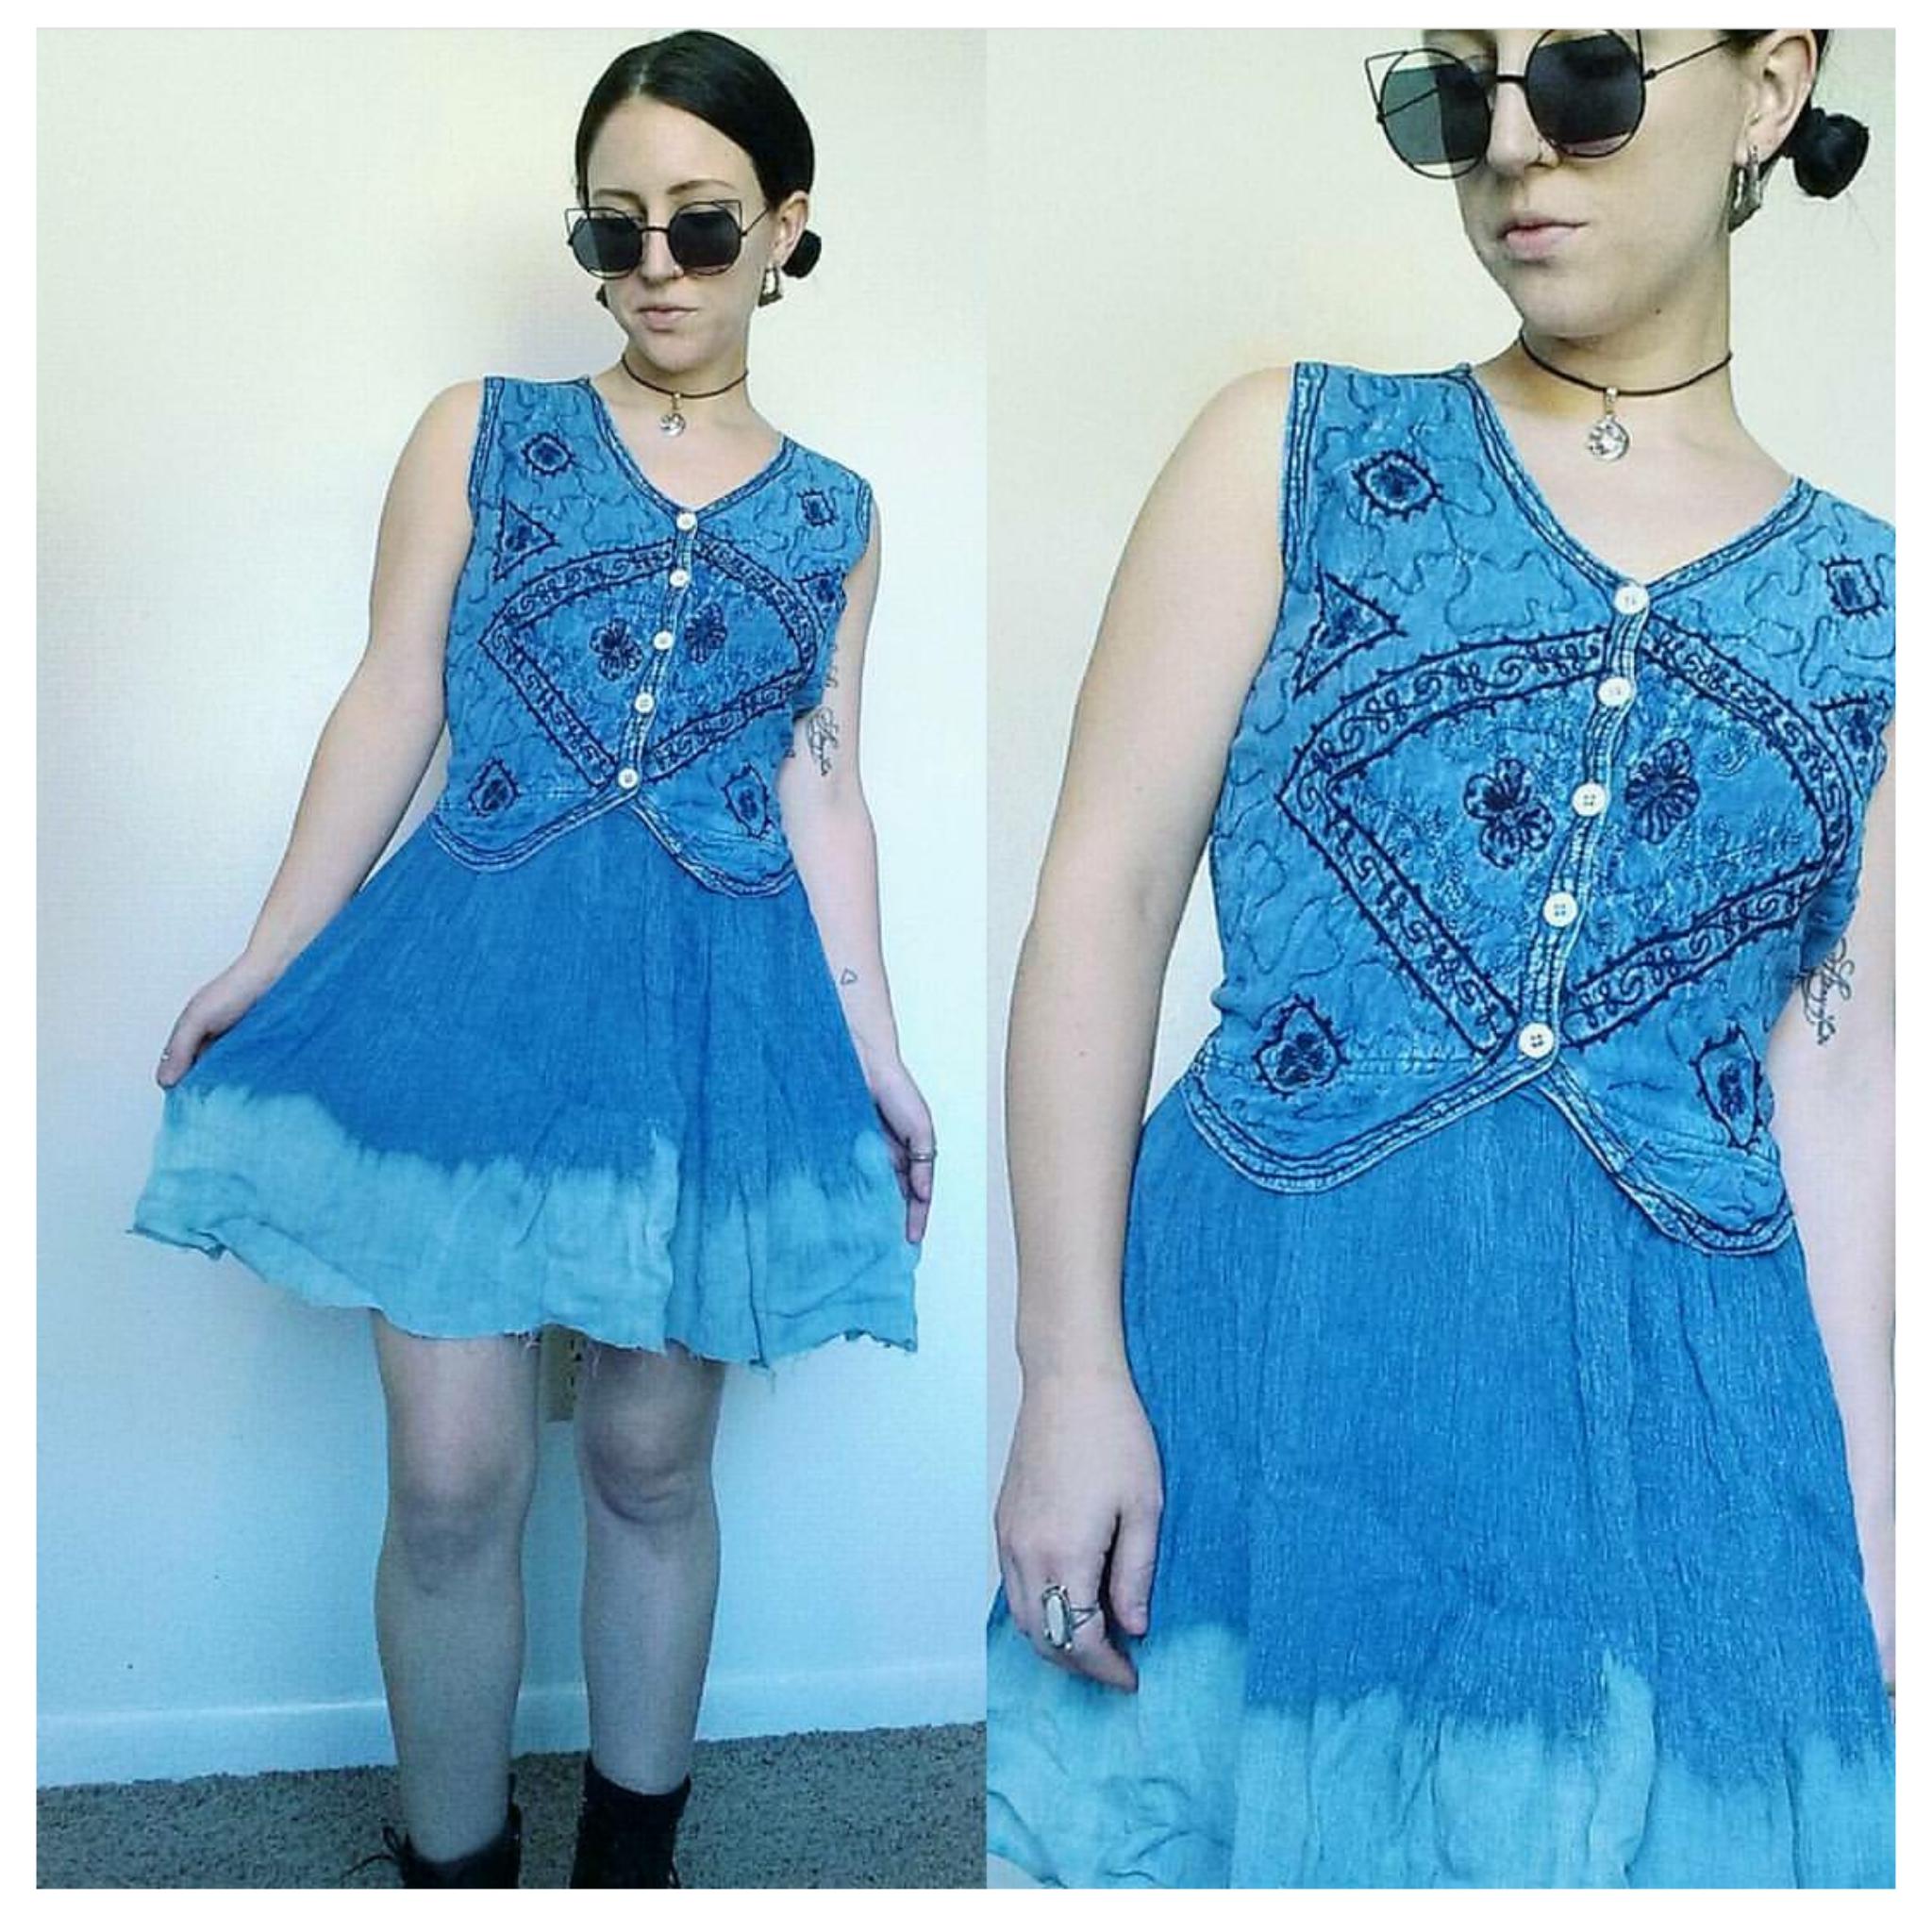 abd302efb1 90 s Tie Dye Embroidered Denim Dress - Vintage Small Bleached Denim ...